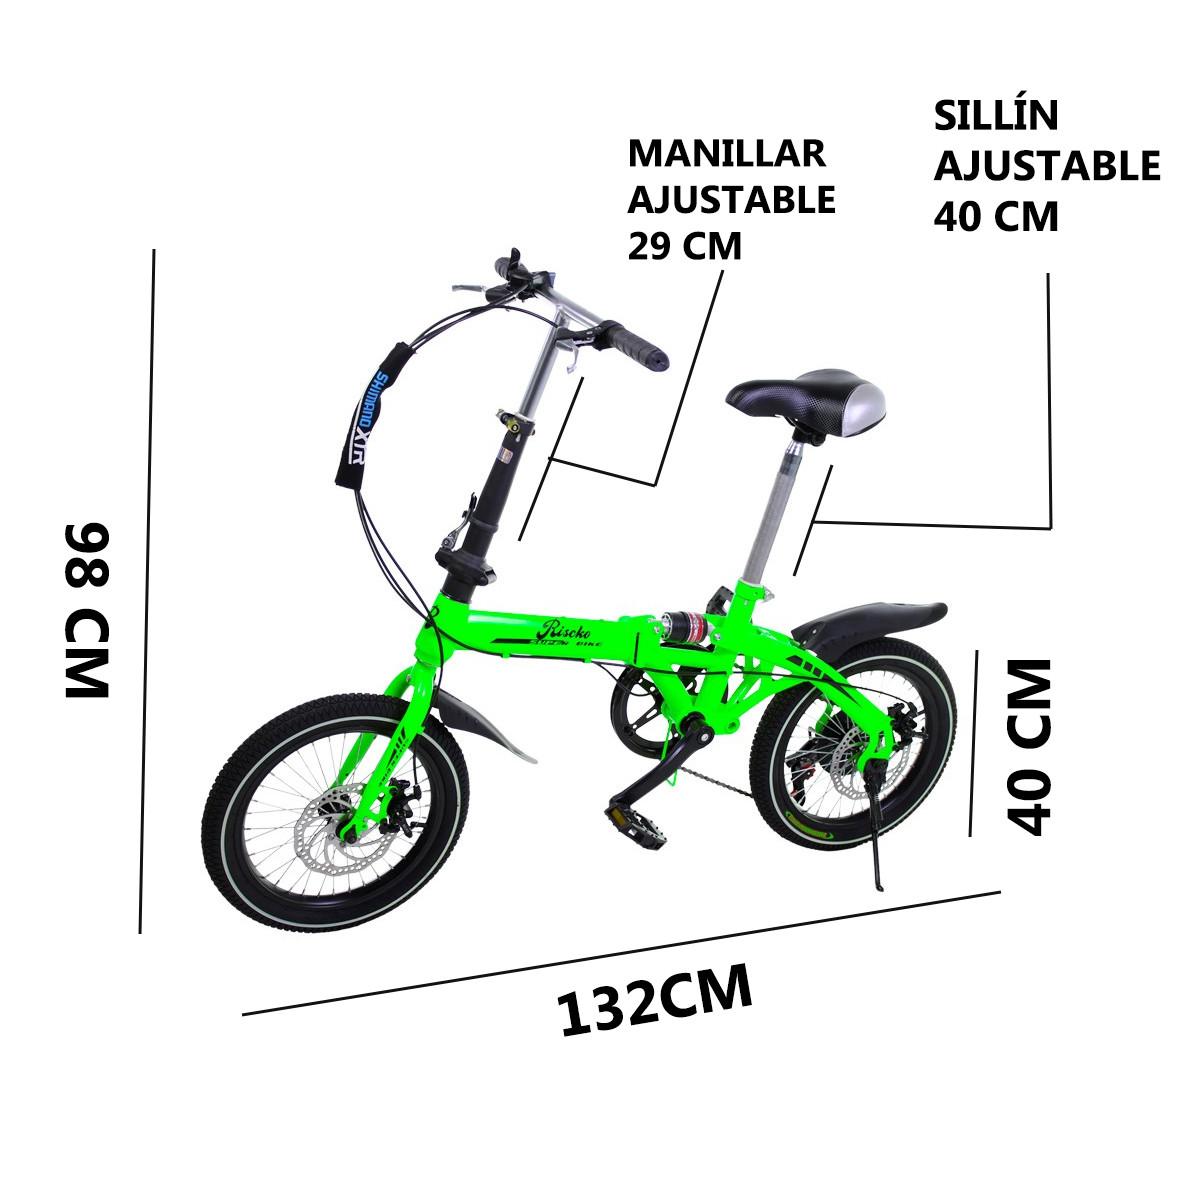 miniatura 14 - Bicicleta-plegable-con-ruedas-de-16-039-039-modelo-Super-Bike